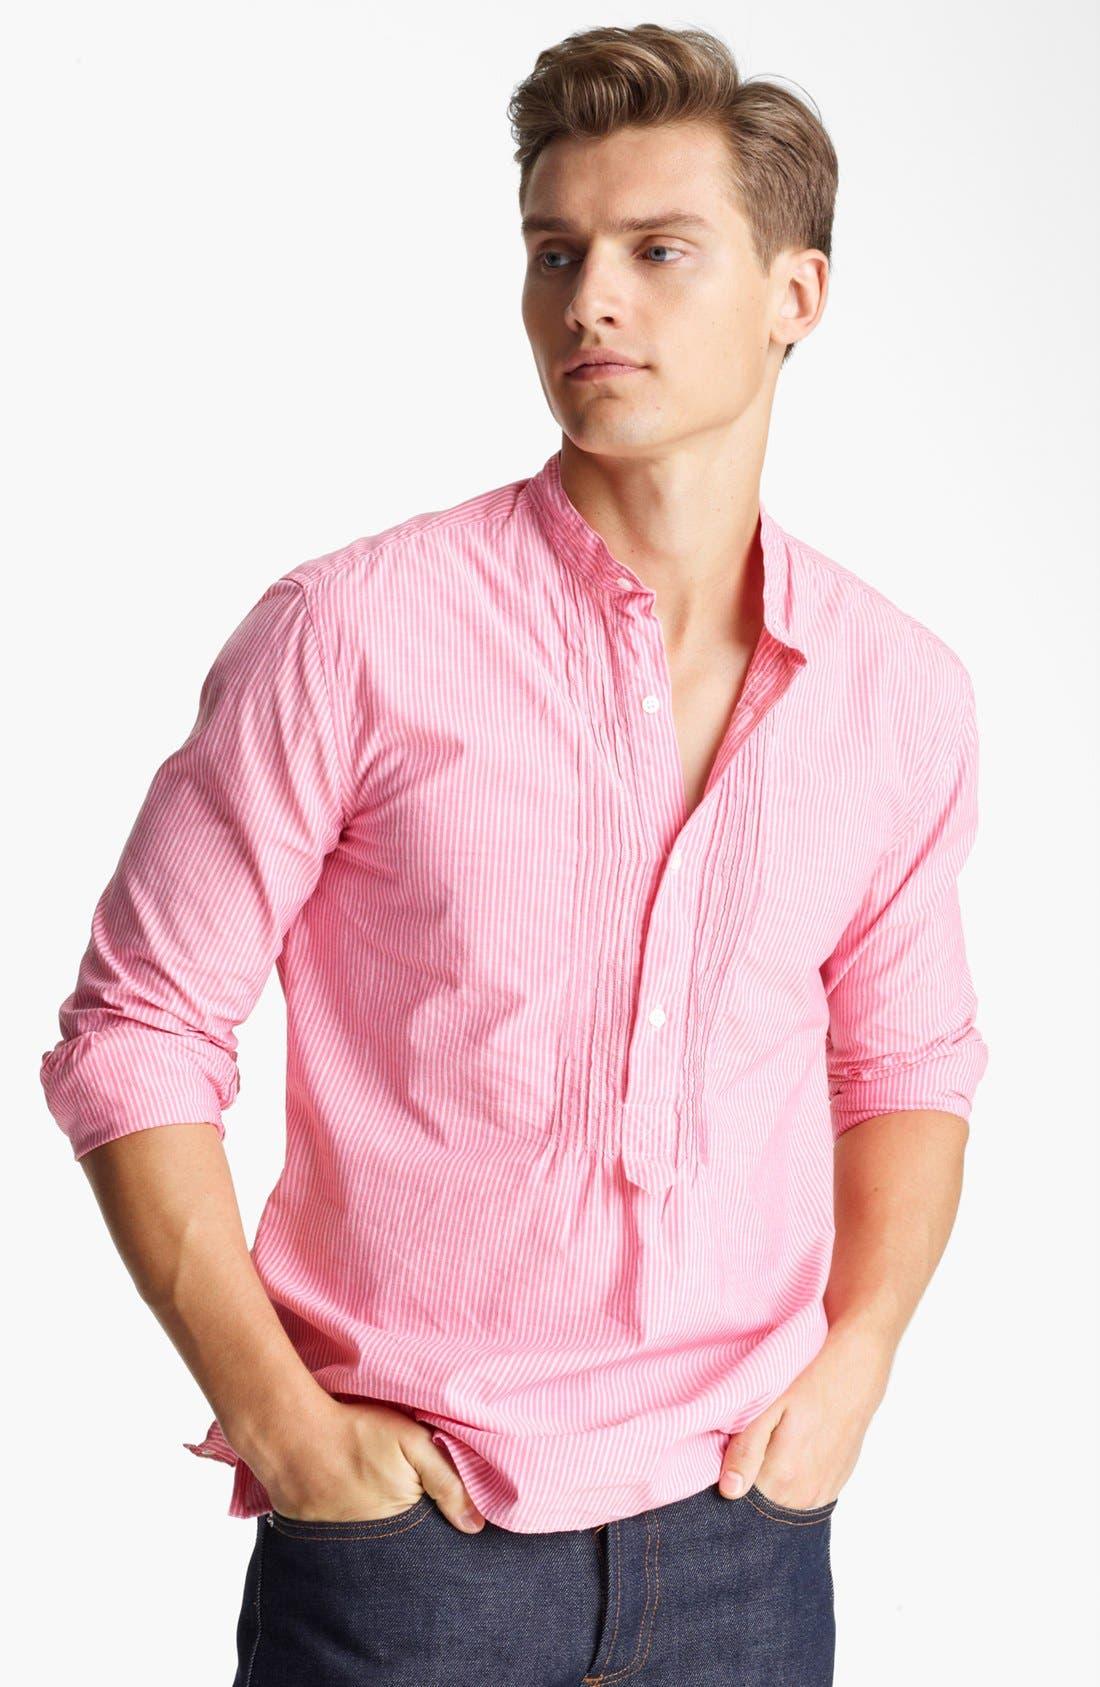 Alternate Image 1 Selected - Michael Bastian 'Indian Wedding' Stripe Popover Shirt